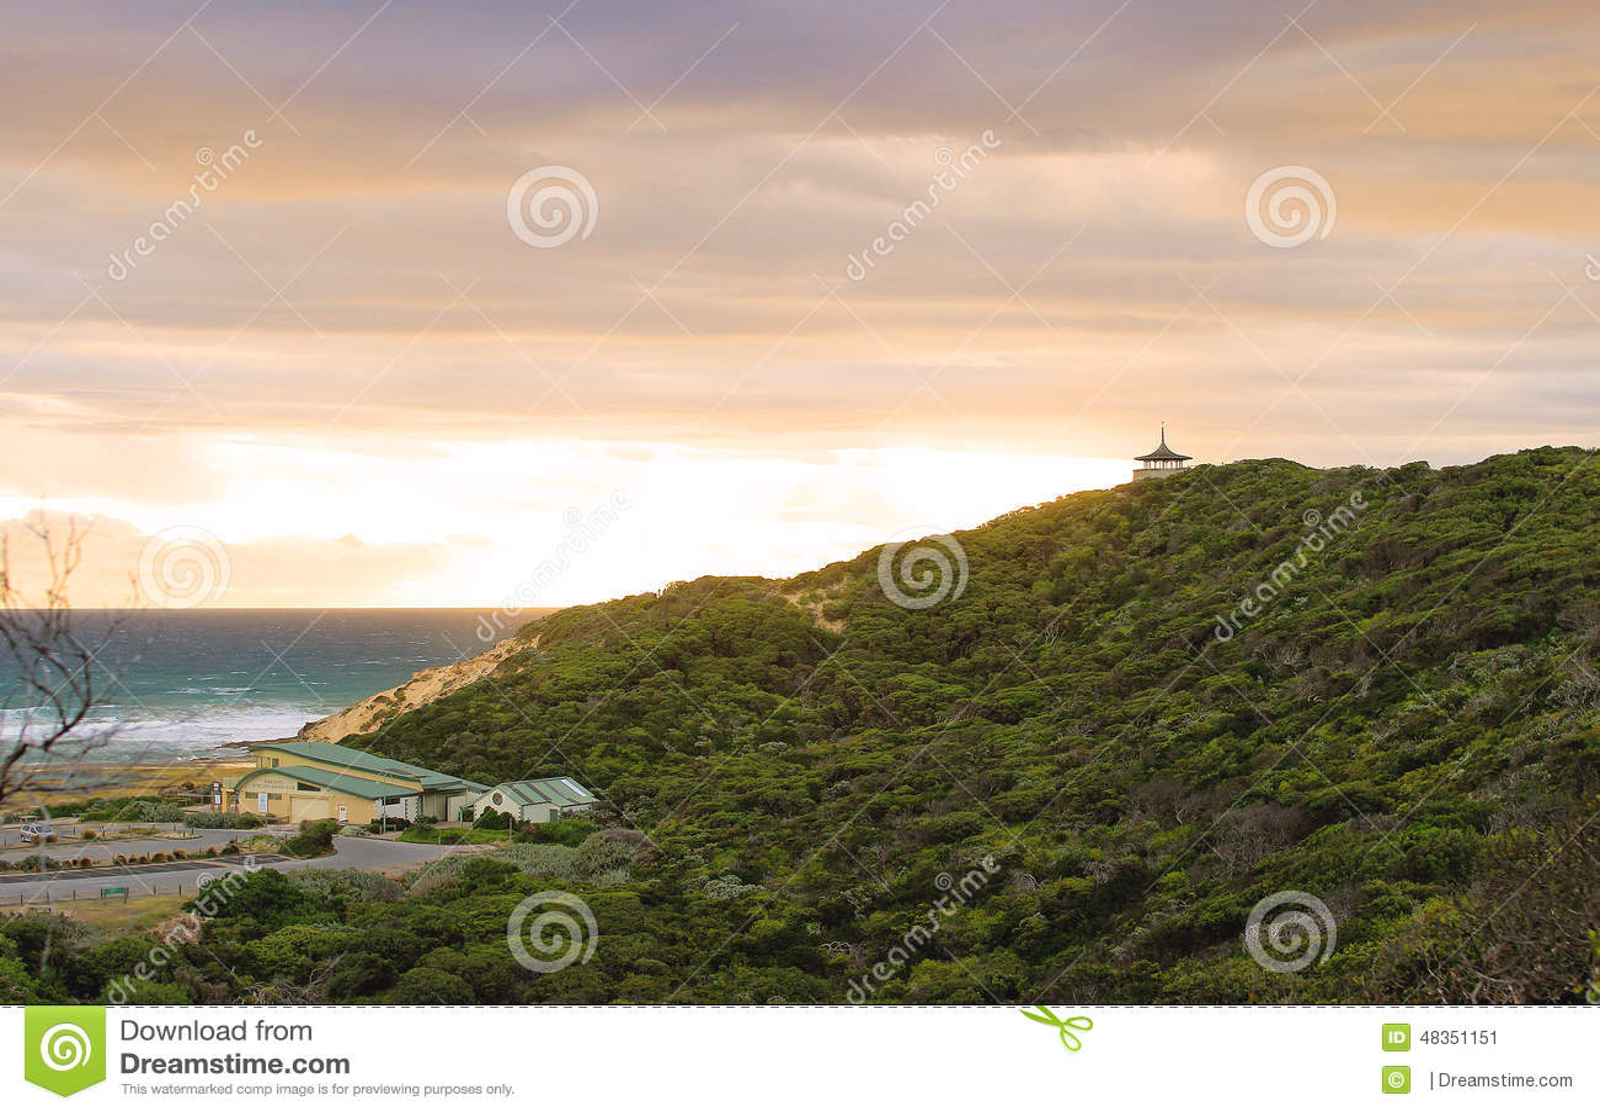 Coppins-Ausblick Sorrent, Australien